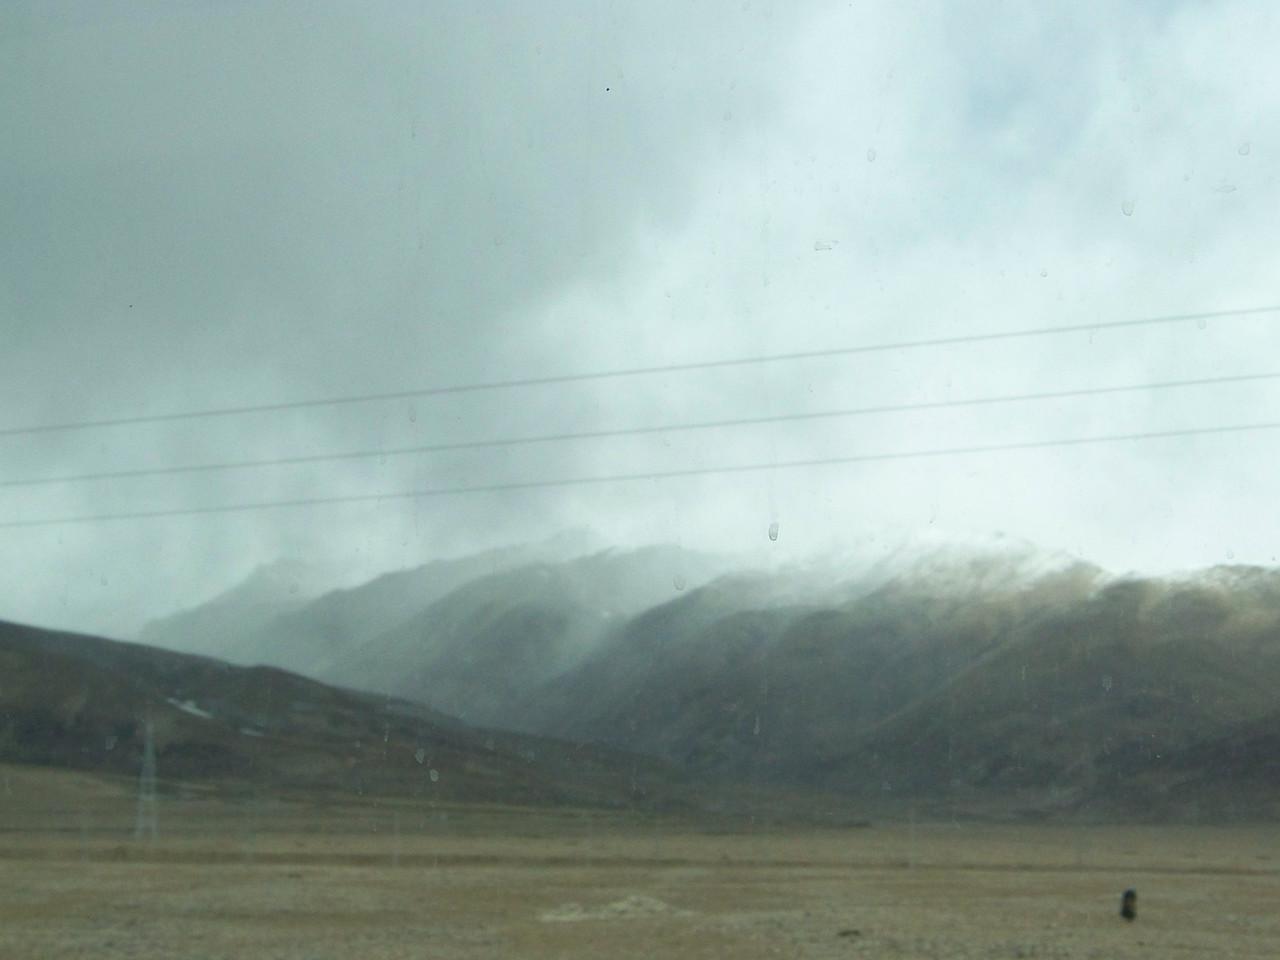 0120 - Scenery on Train Trip Between Beijing and Lhasa.JPG